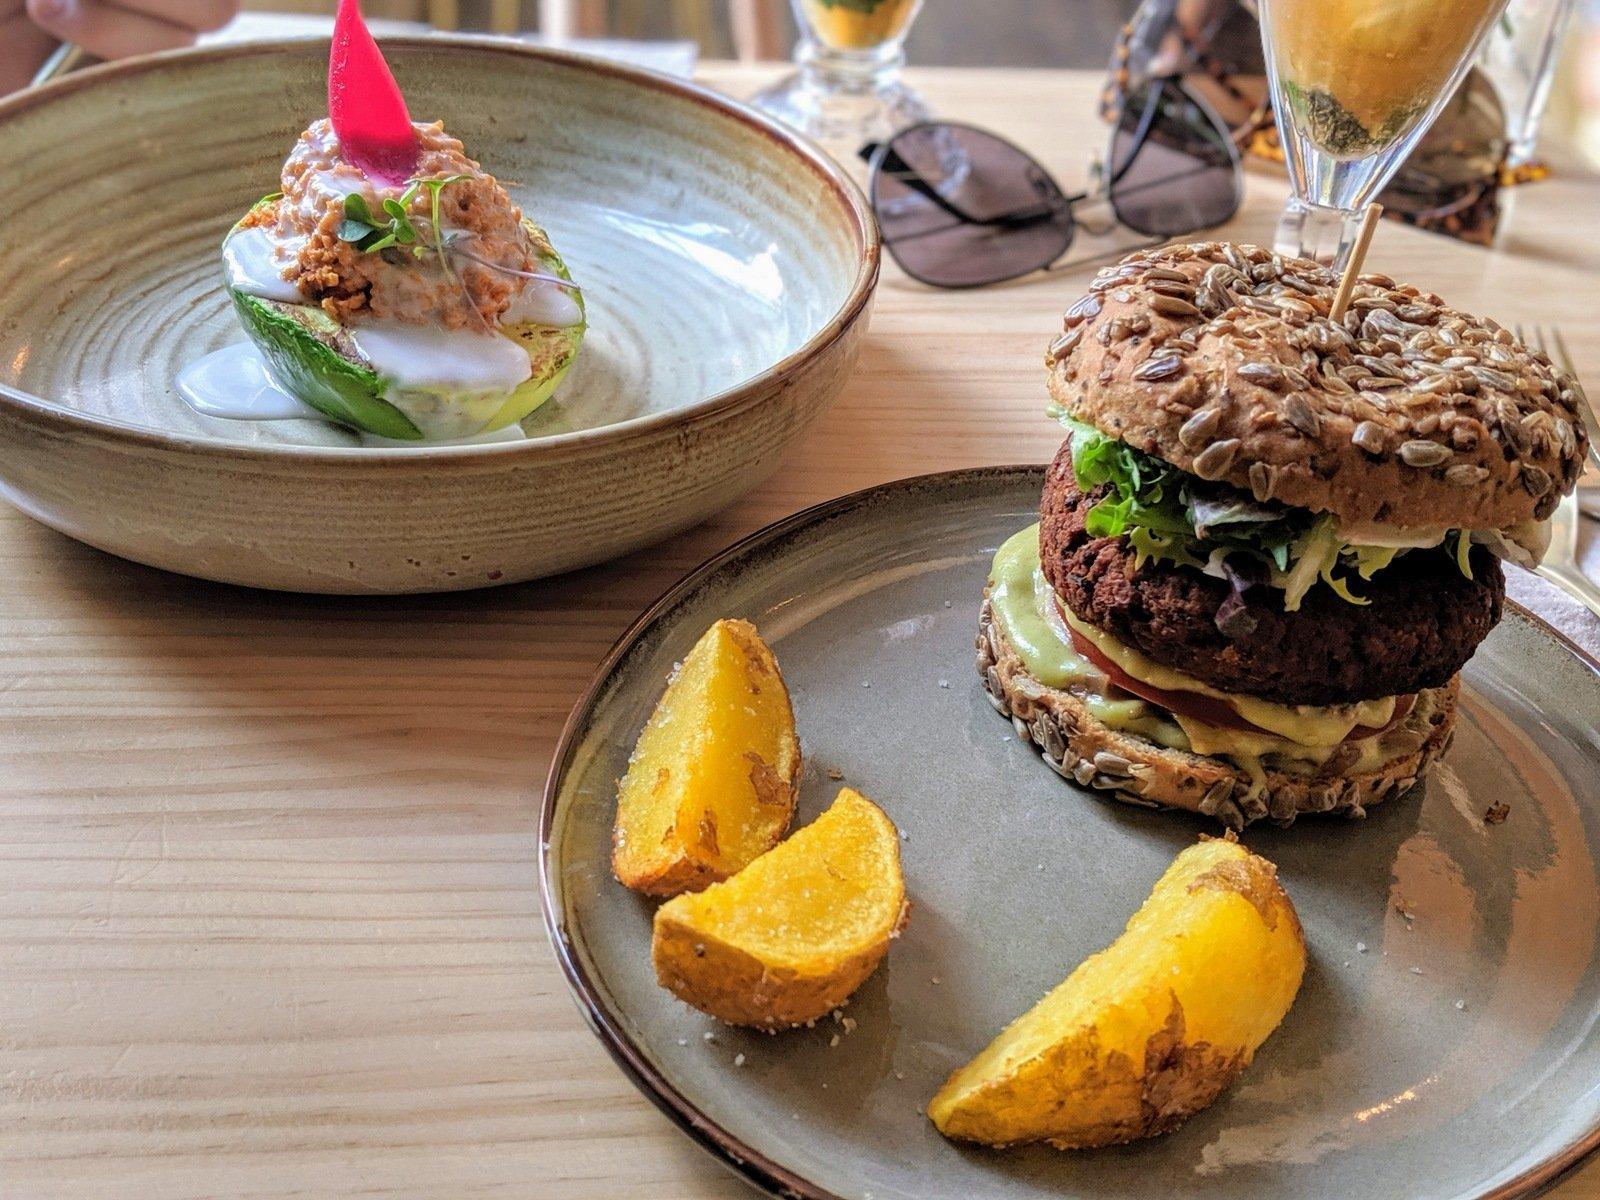 Avocado Love burger and Jack daniels avocado